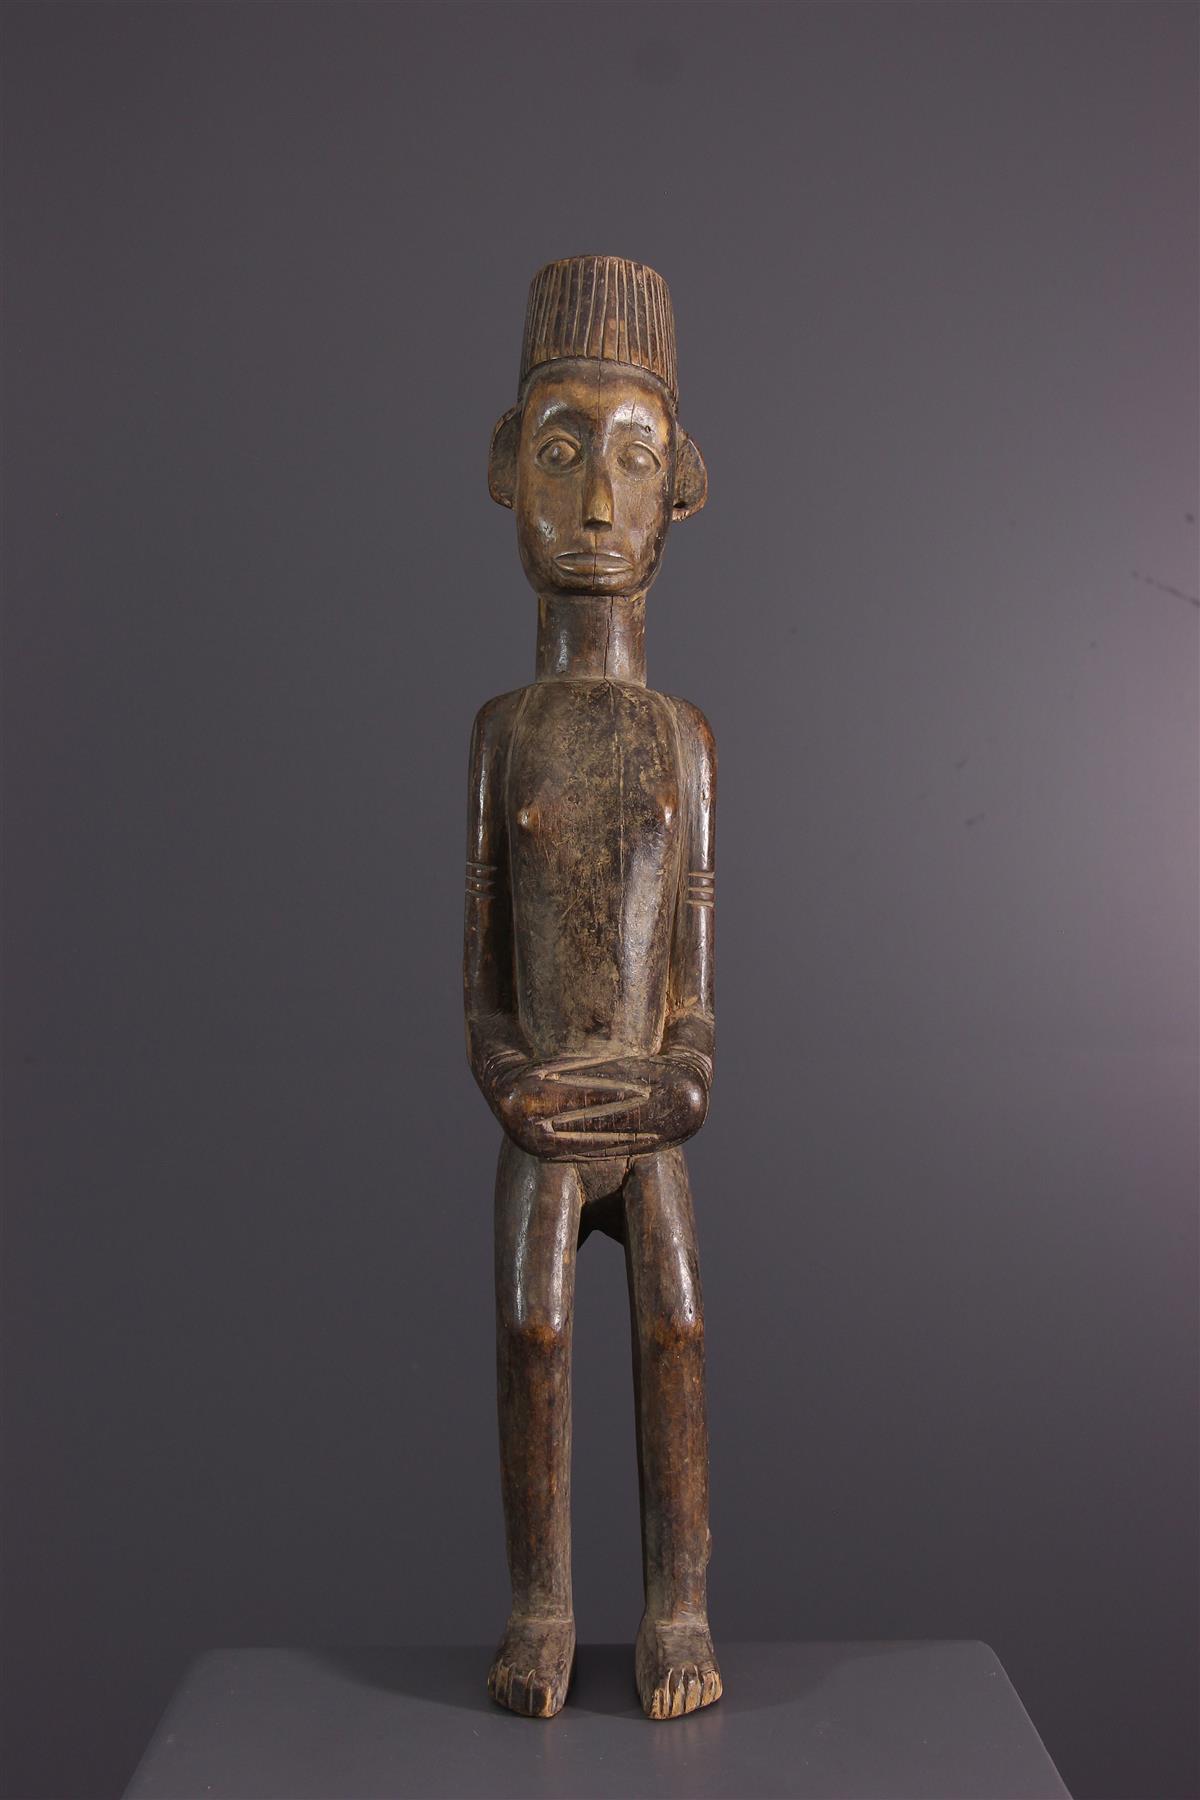 Ewe colon  - African art